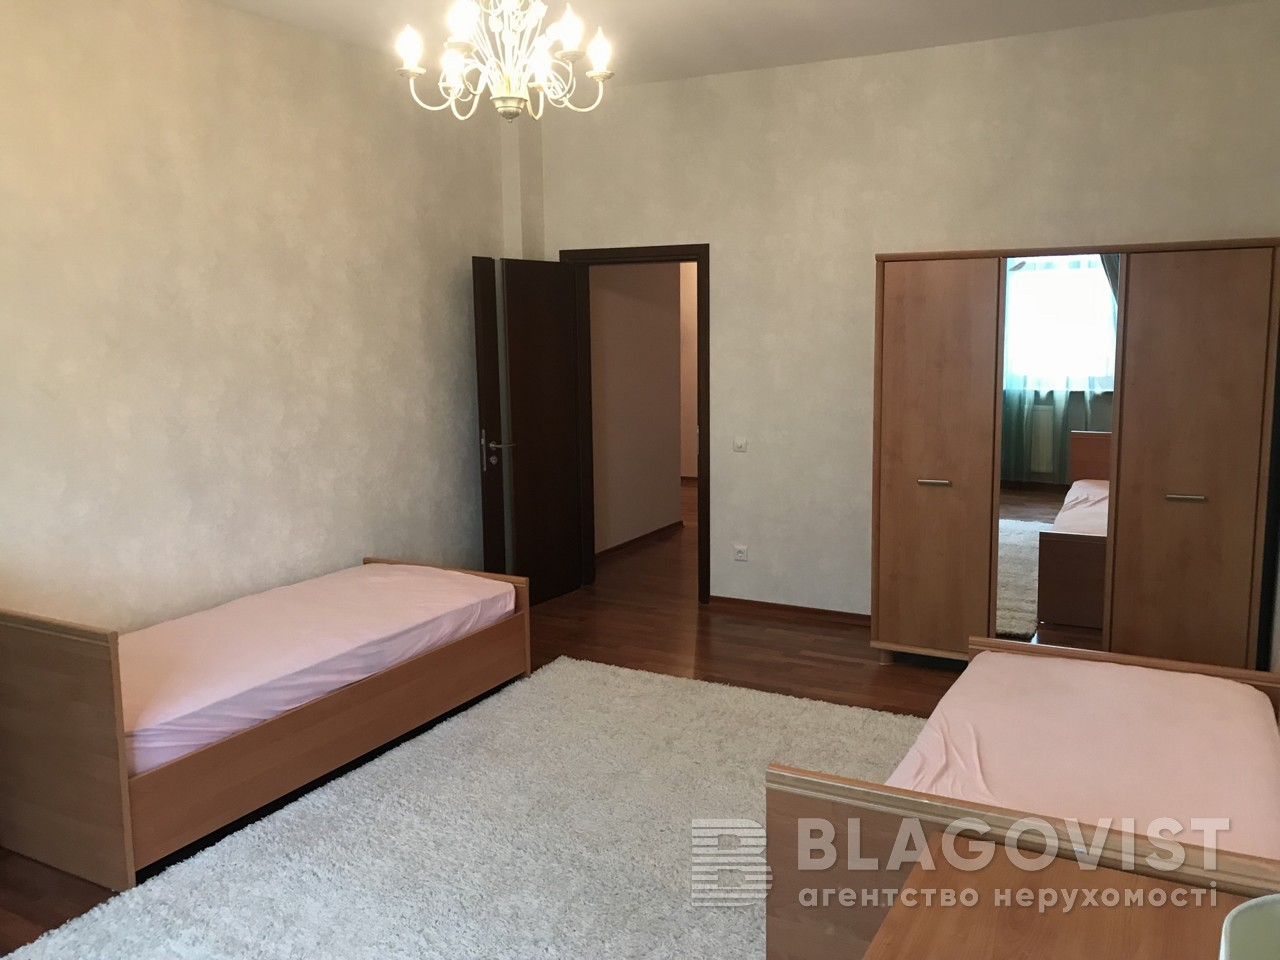 Квартира A-73479, Коновальца Евгения (Щорса), 32а, Киев - Фото 26